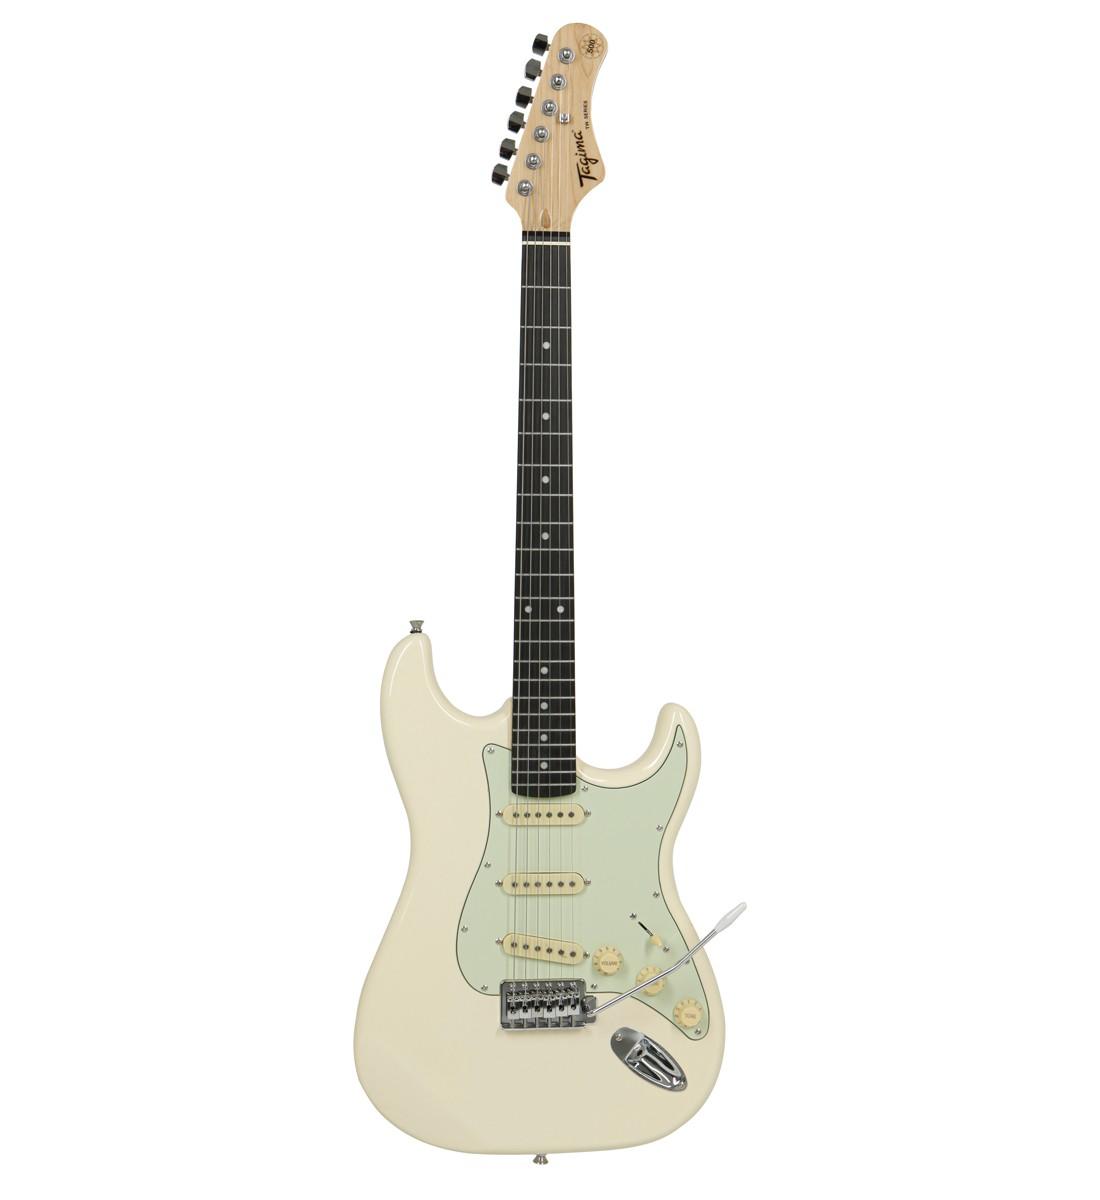 Guitarra Tagima TG500 Woodstock Branco Metálico TG-500  - MegaLojaSP